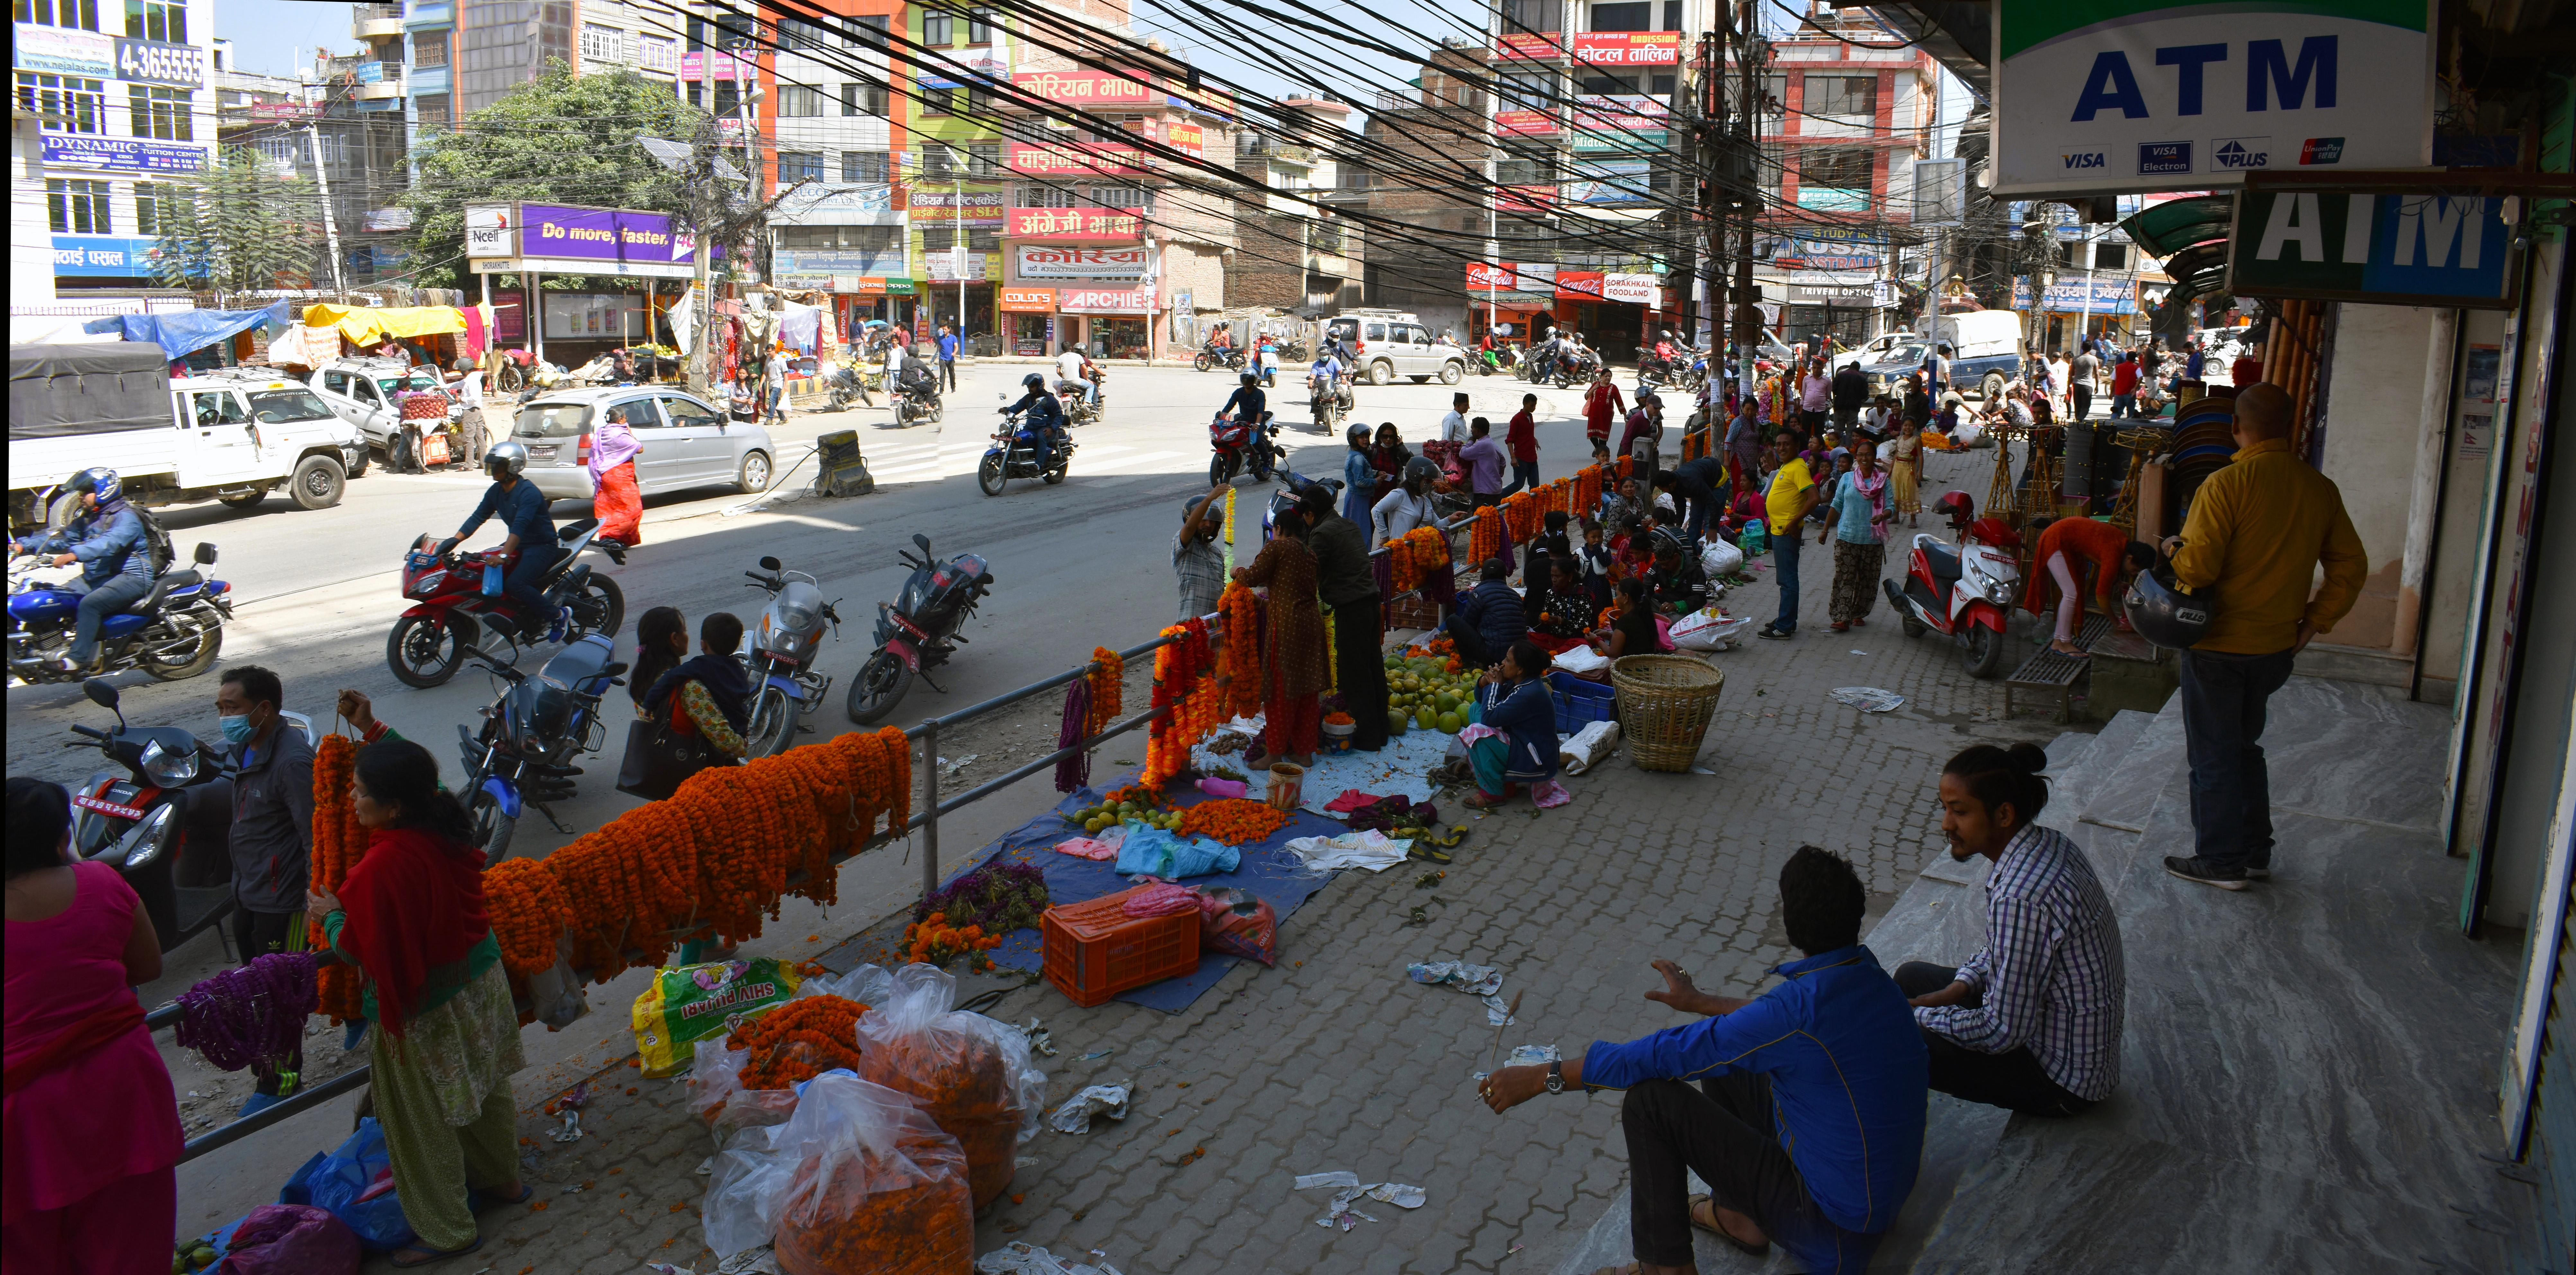 Free photo: Naya Bazar Kathmandu - Shop, Road, People - Free